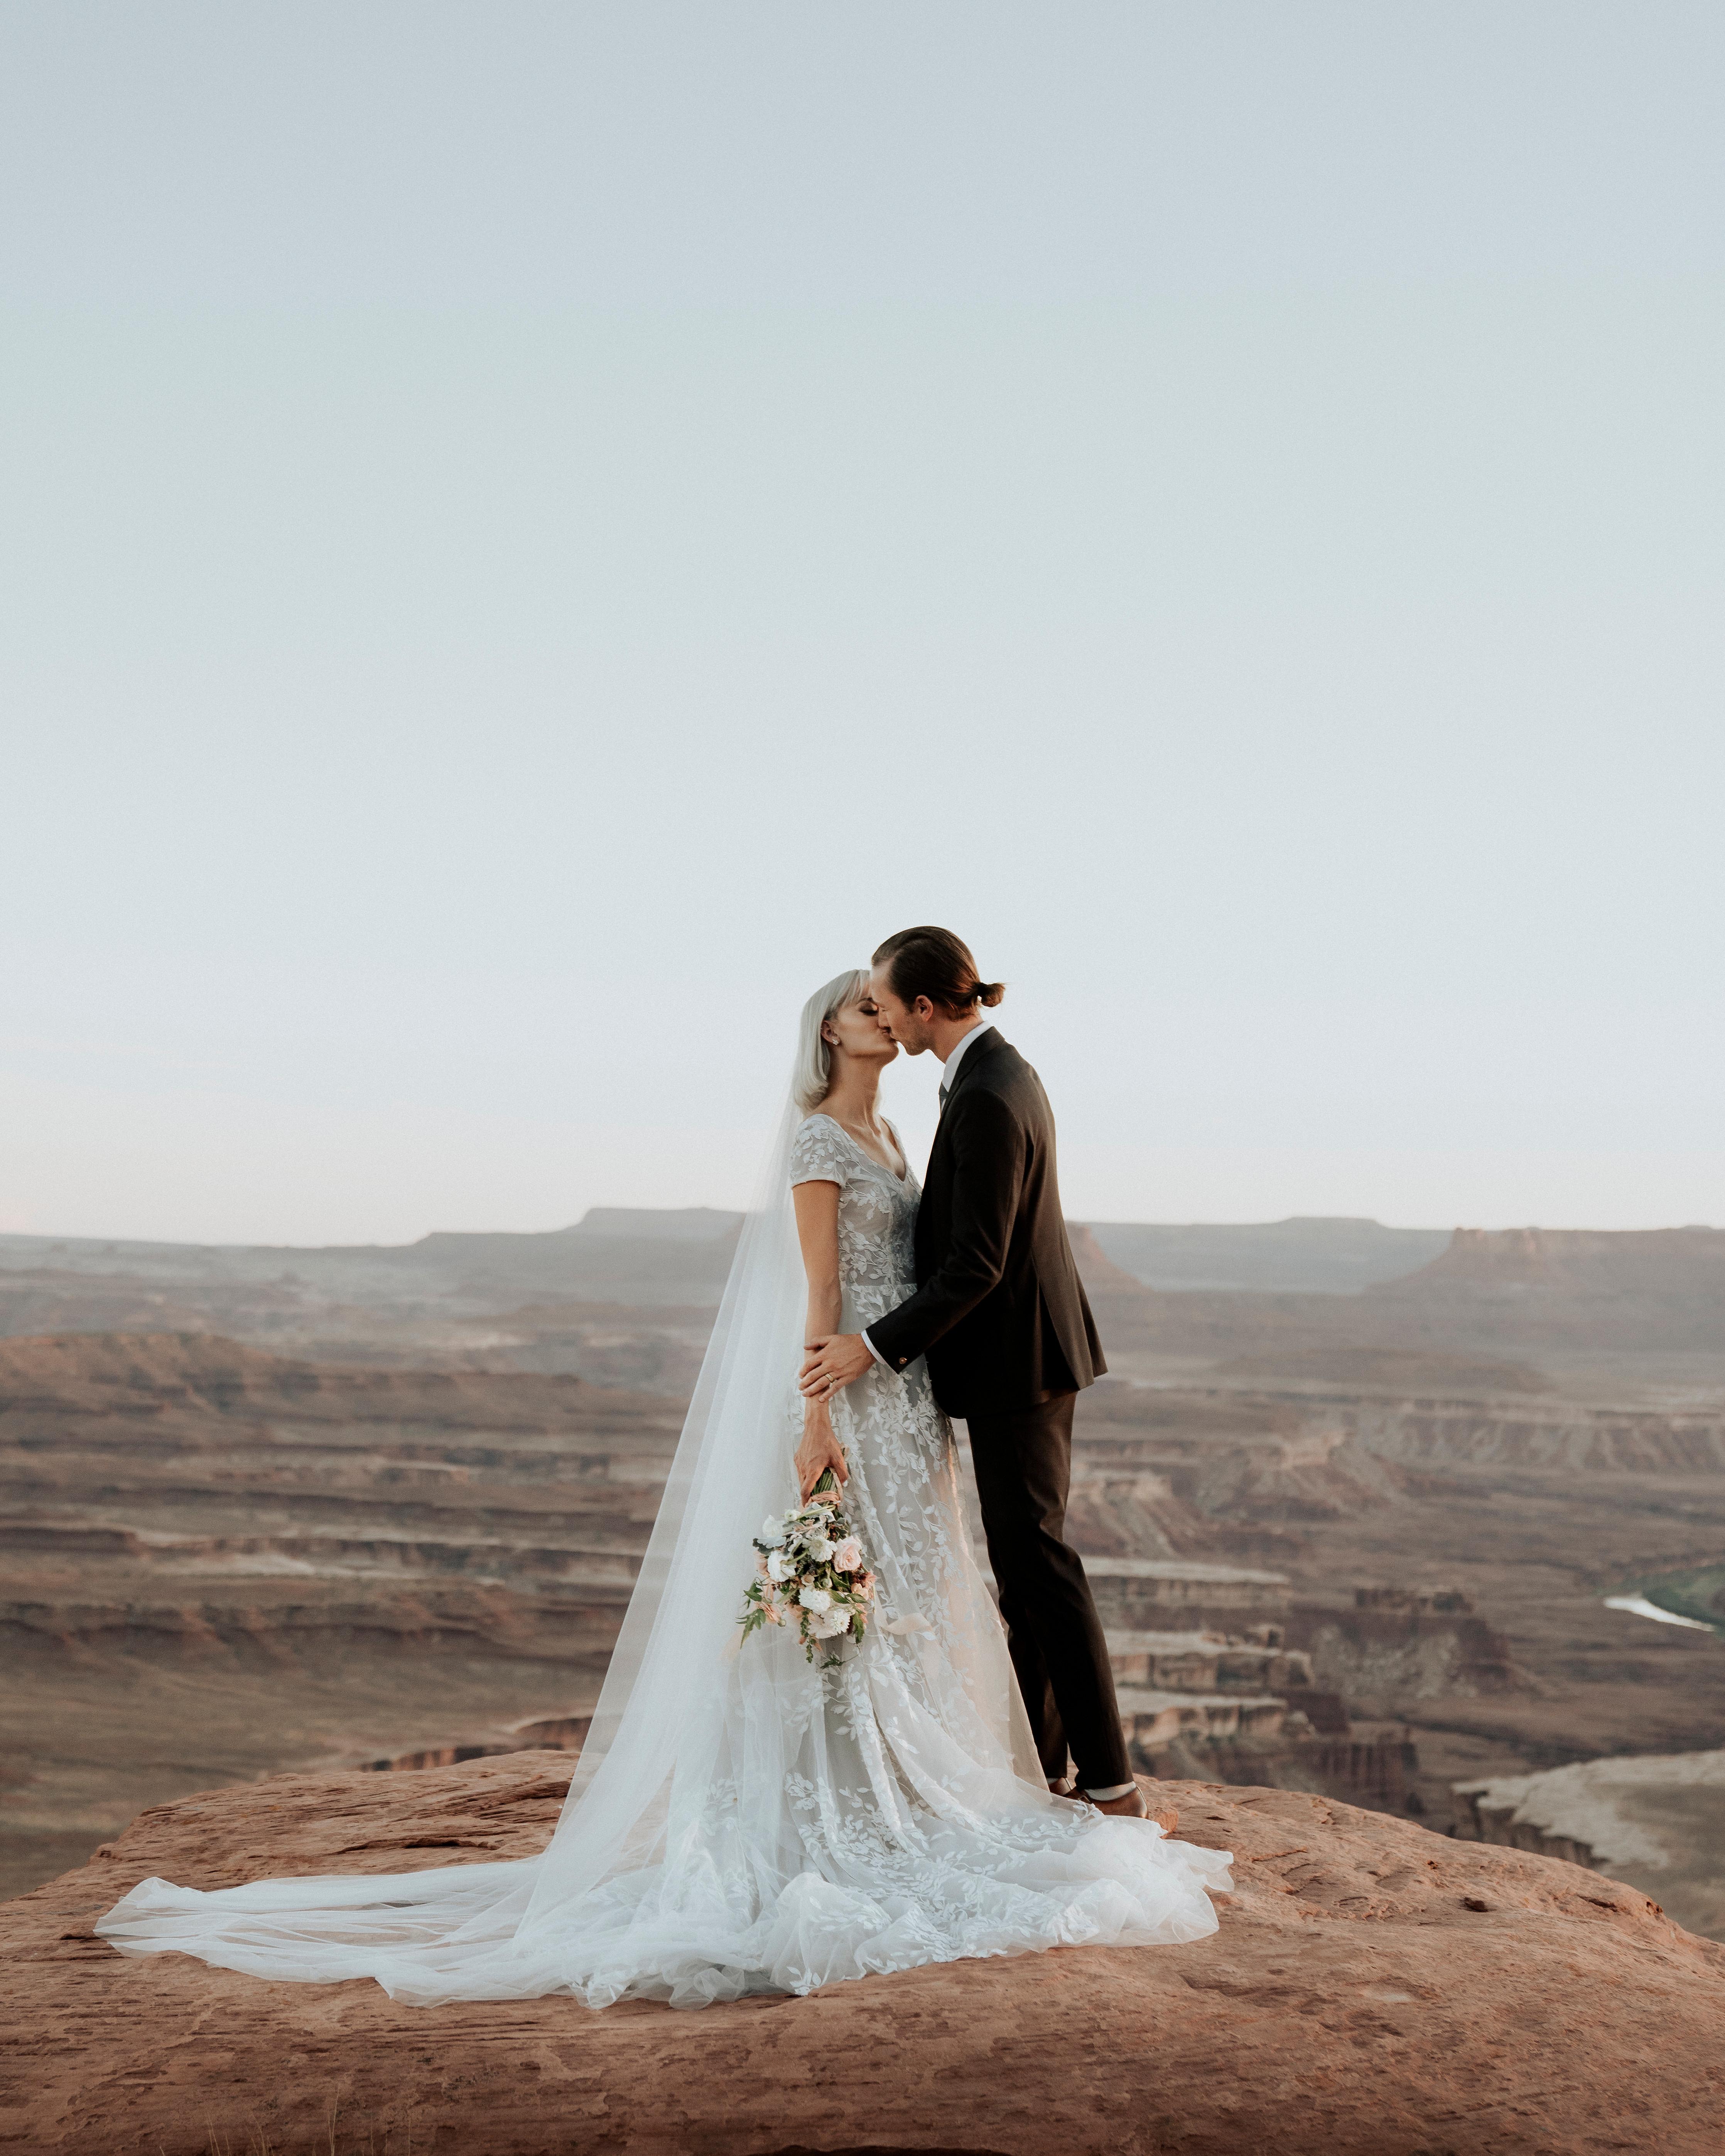 Engagement/Bridal Sessions